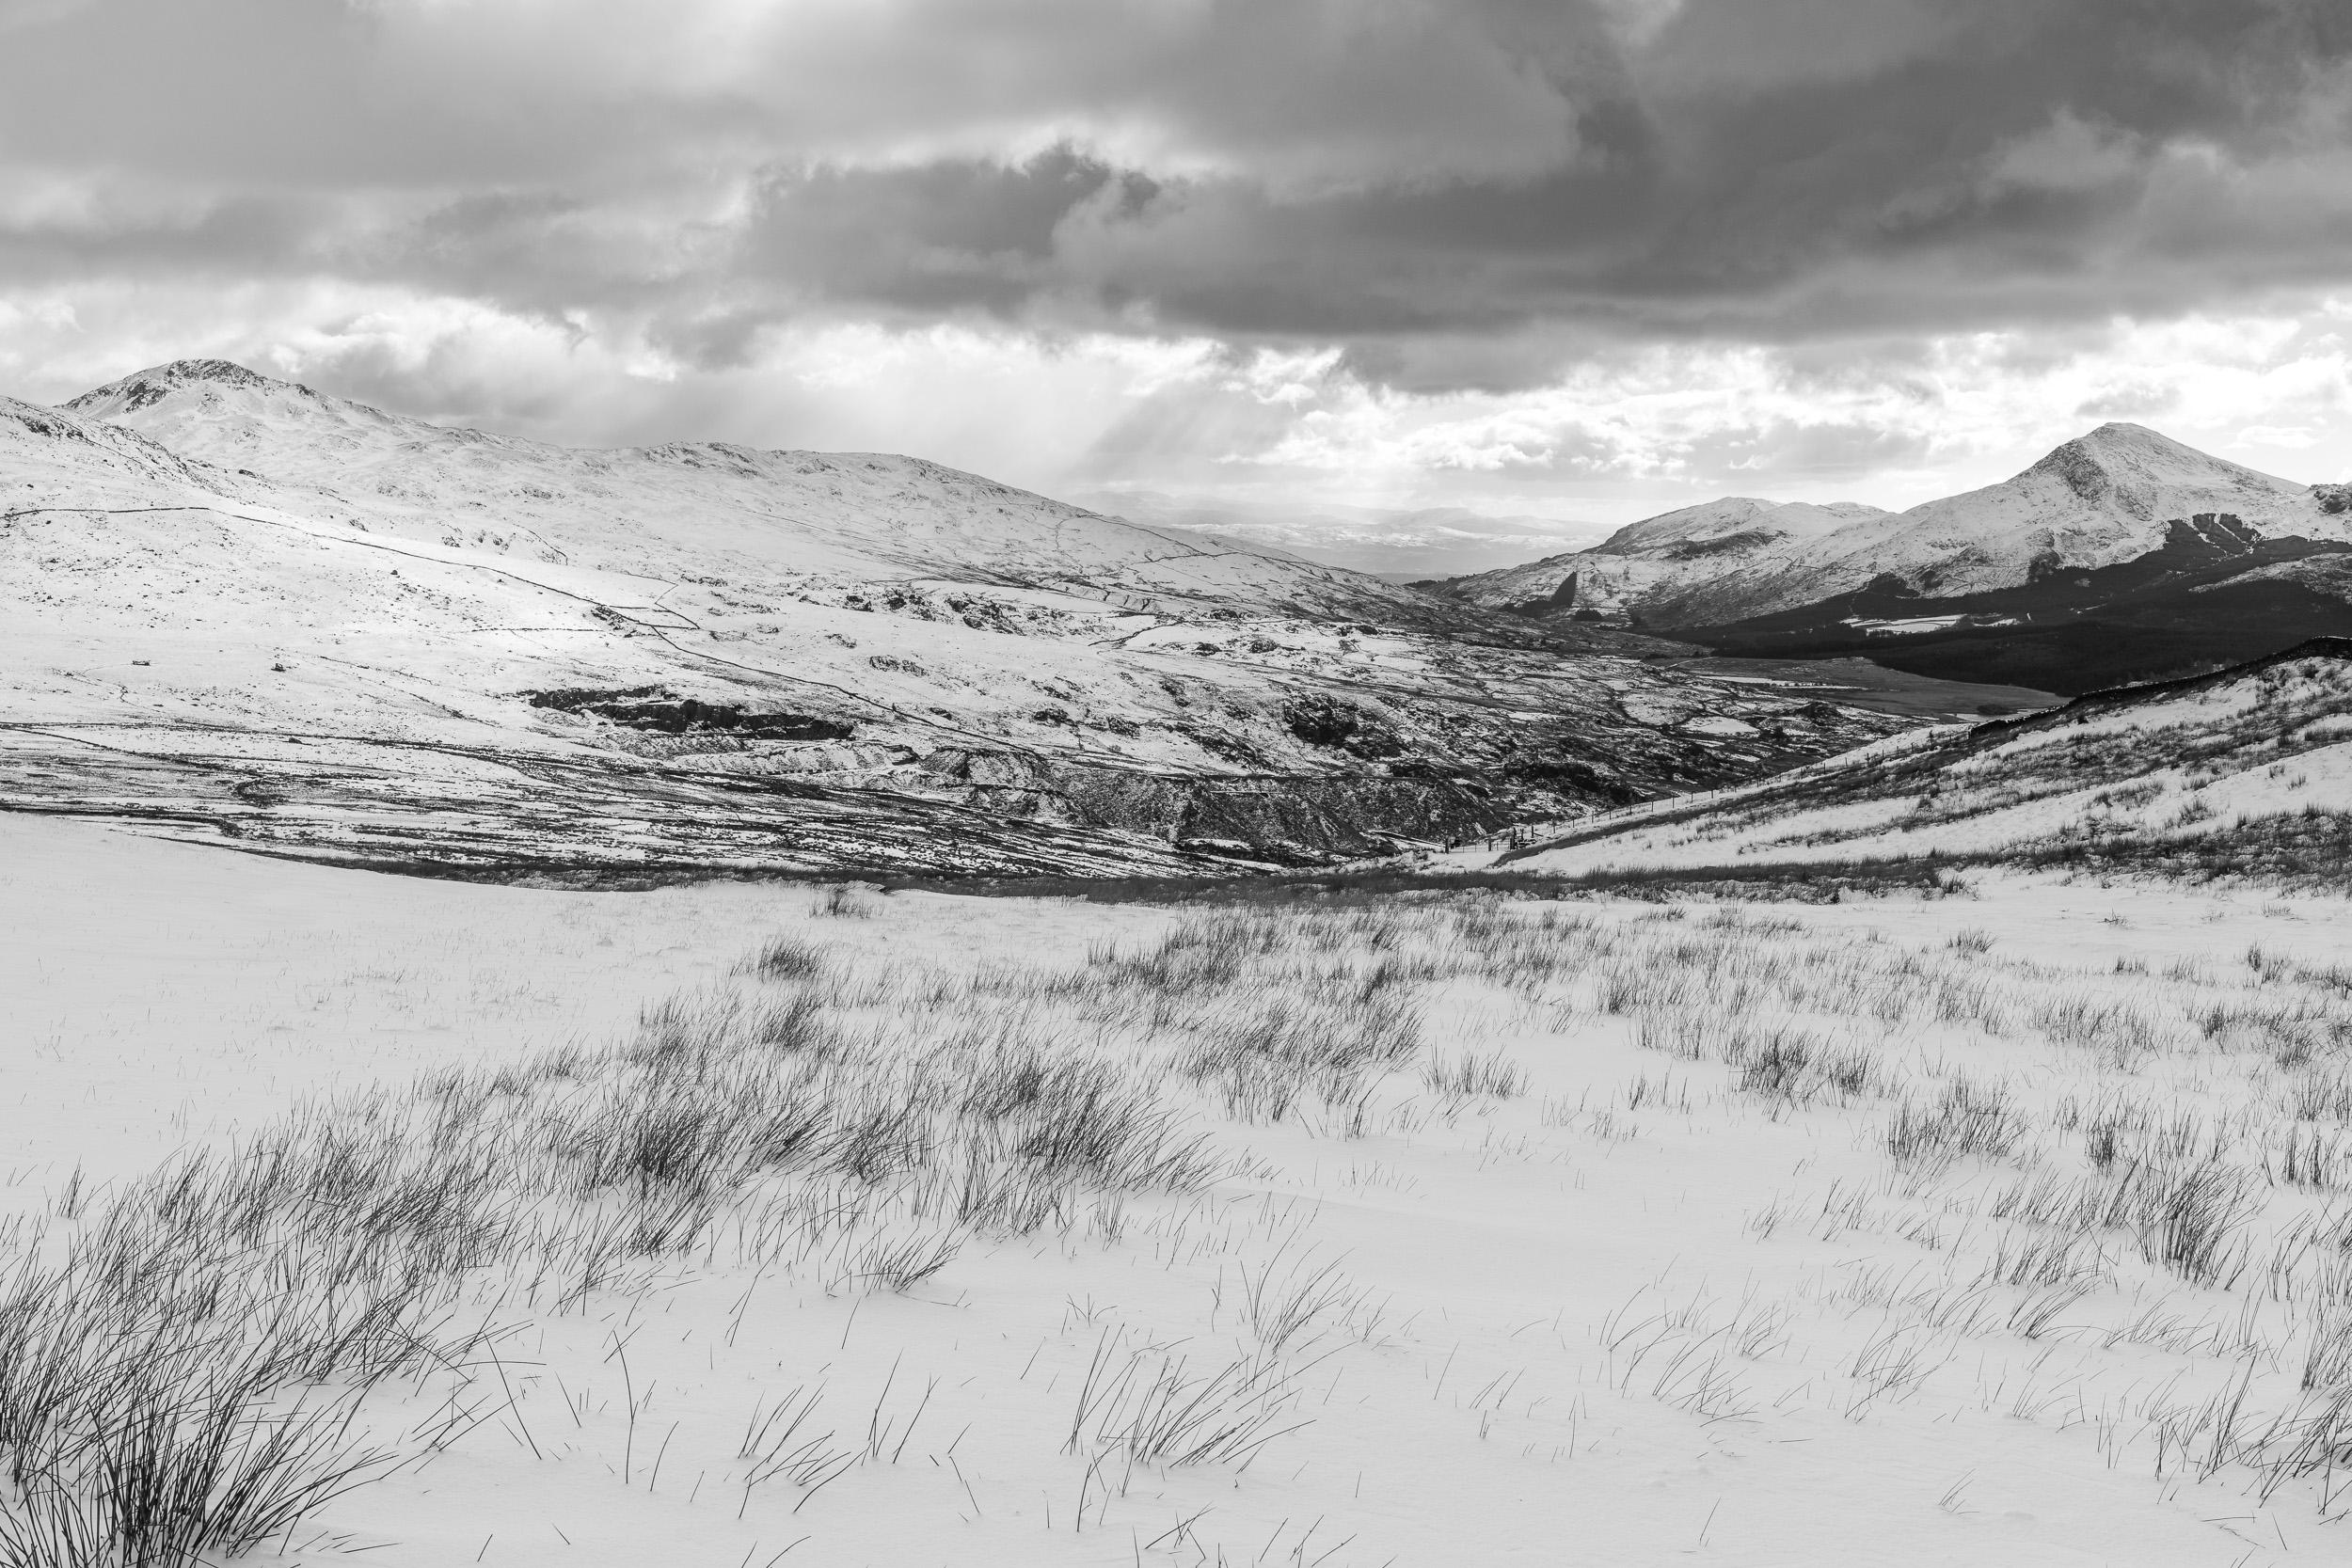 Yr Aran, Craig Wen and Moel Hebog from Bwlch Maesgwm, Snowdonia National Park  - Nikon D850, Nikkor 24-70 mm f/2.8 VR at 34 mm, f/11, 1/60th sec at ISO 64, polariser and ND grad.